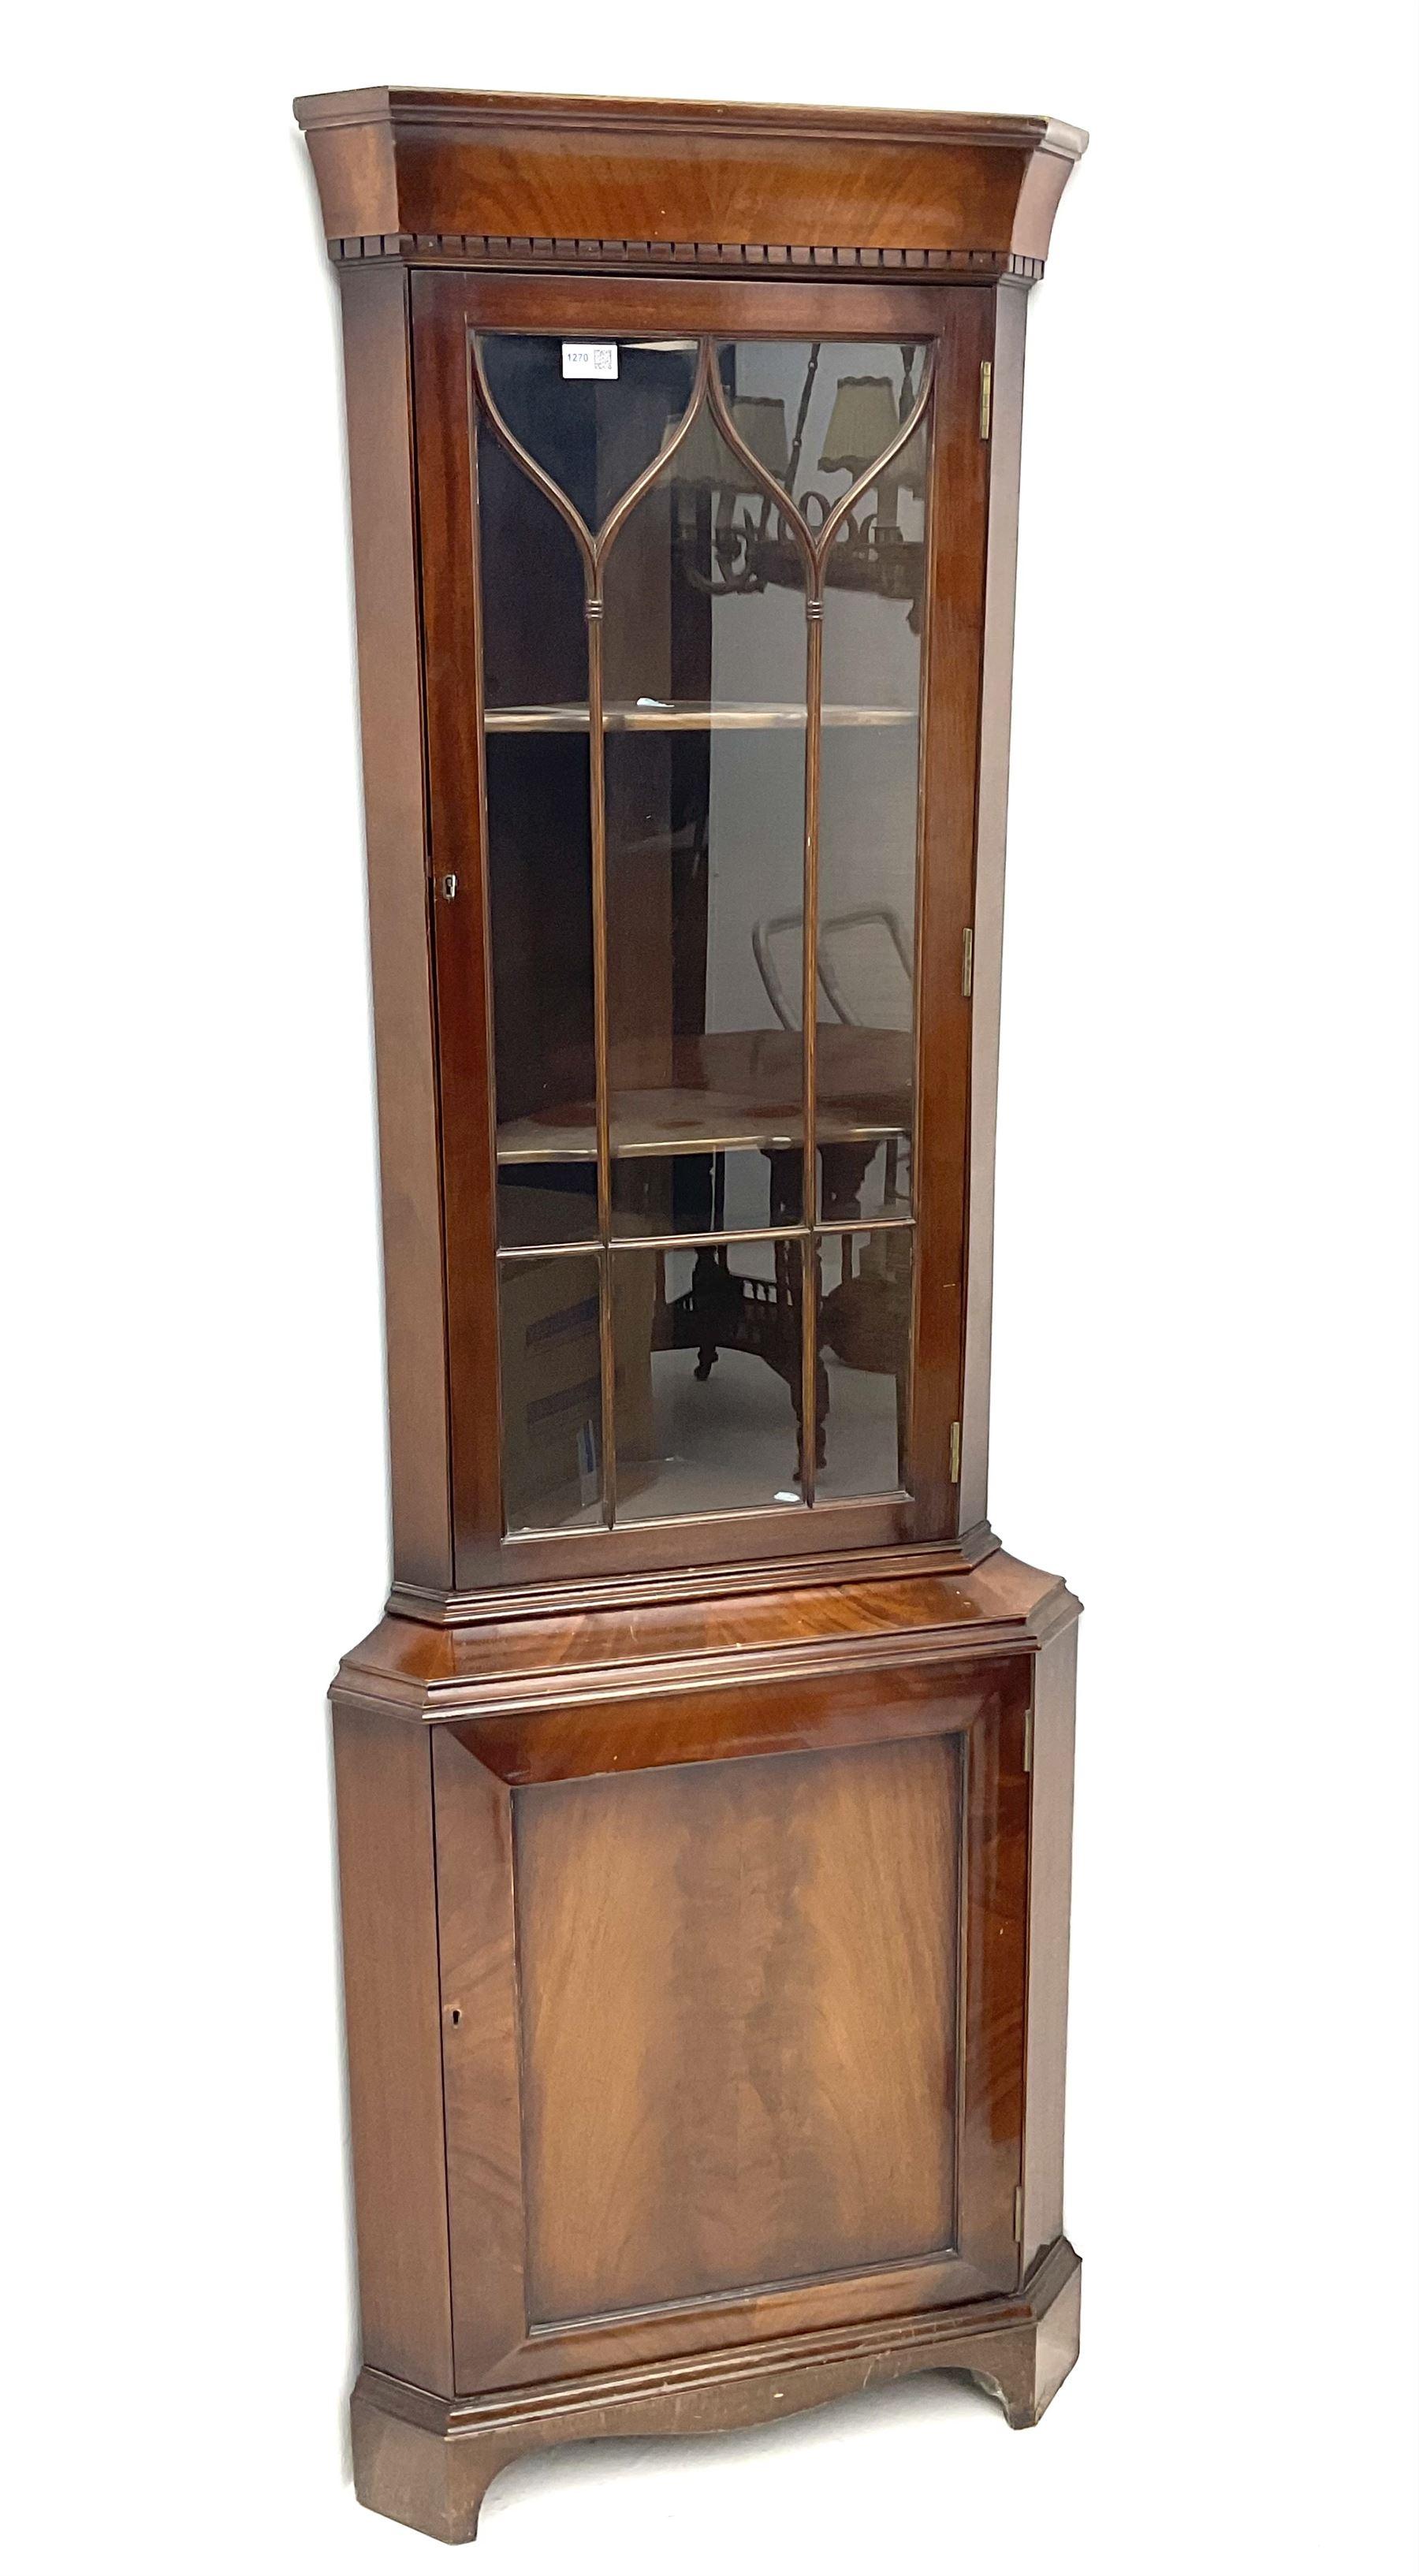 Late 20th century mahogany corner display cabinet